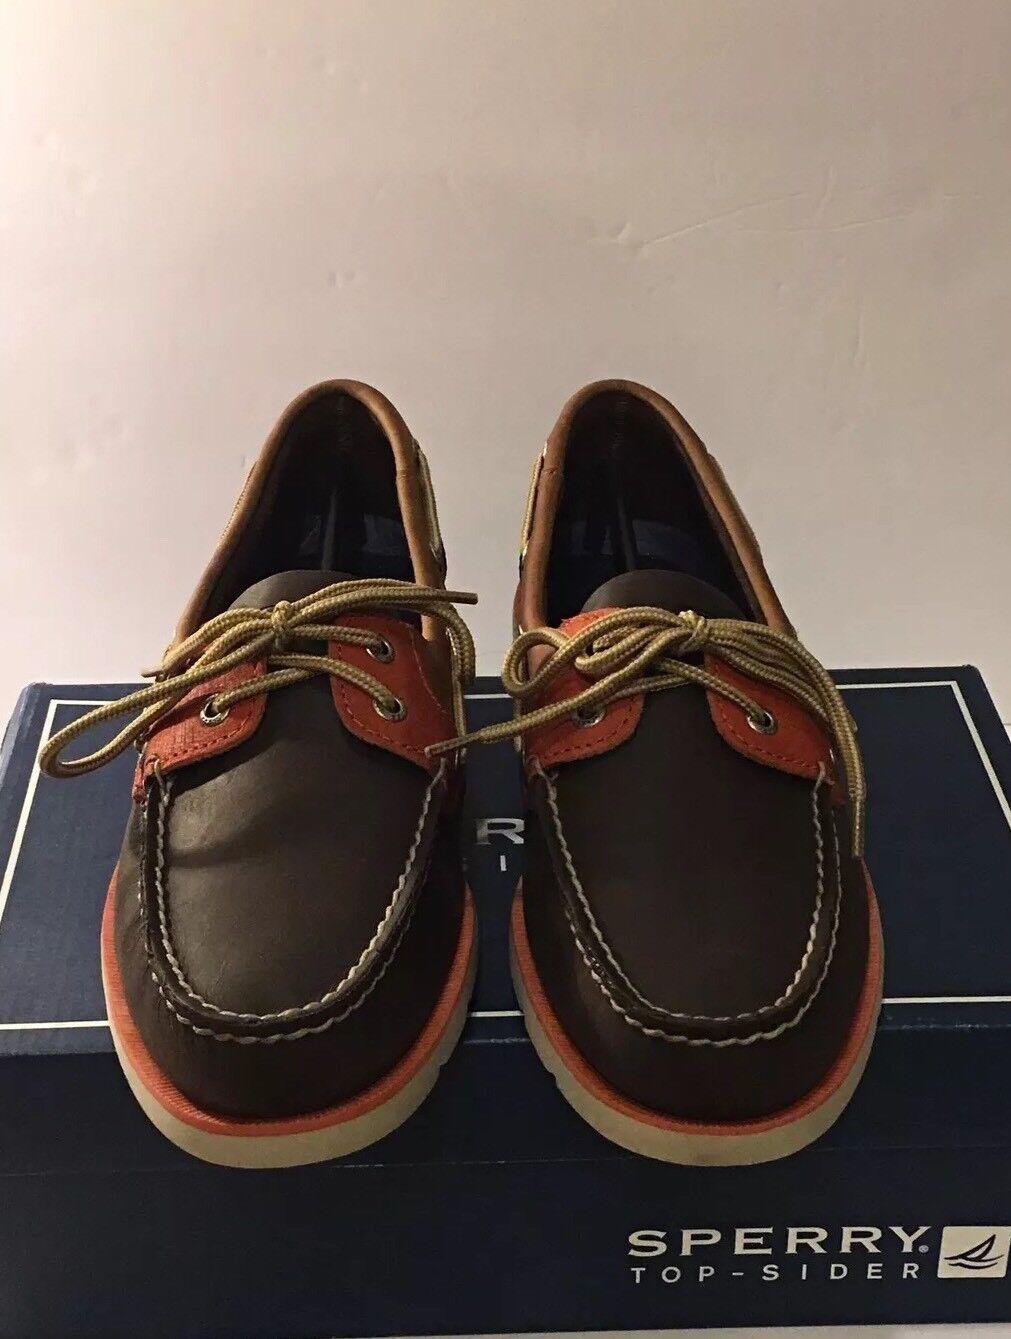 Scarpe casual da uomo  Sperry Top Sider Leeward DK Brown Tan Orange Size 9 uomo's